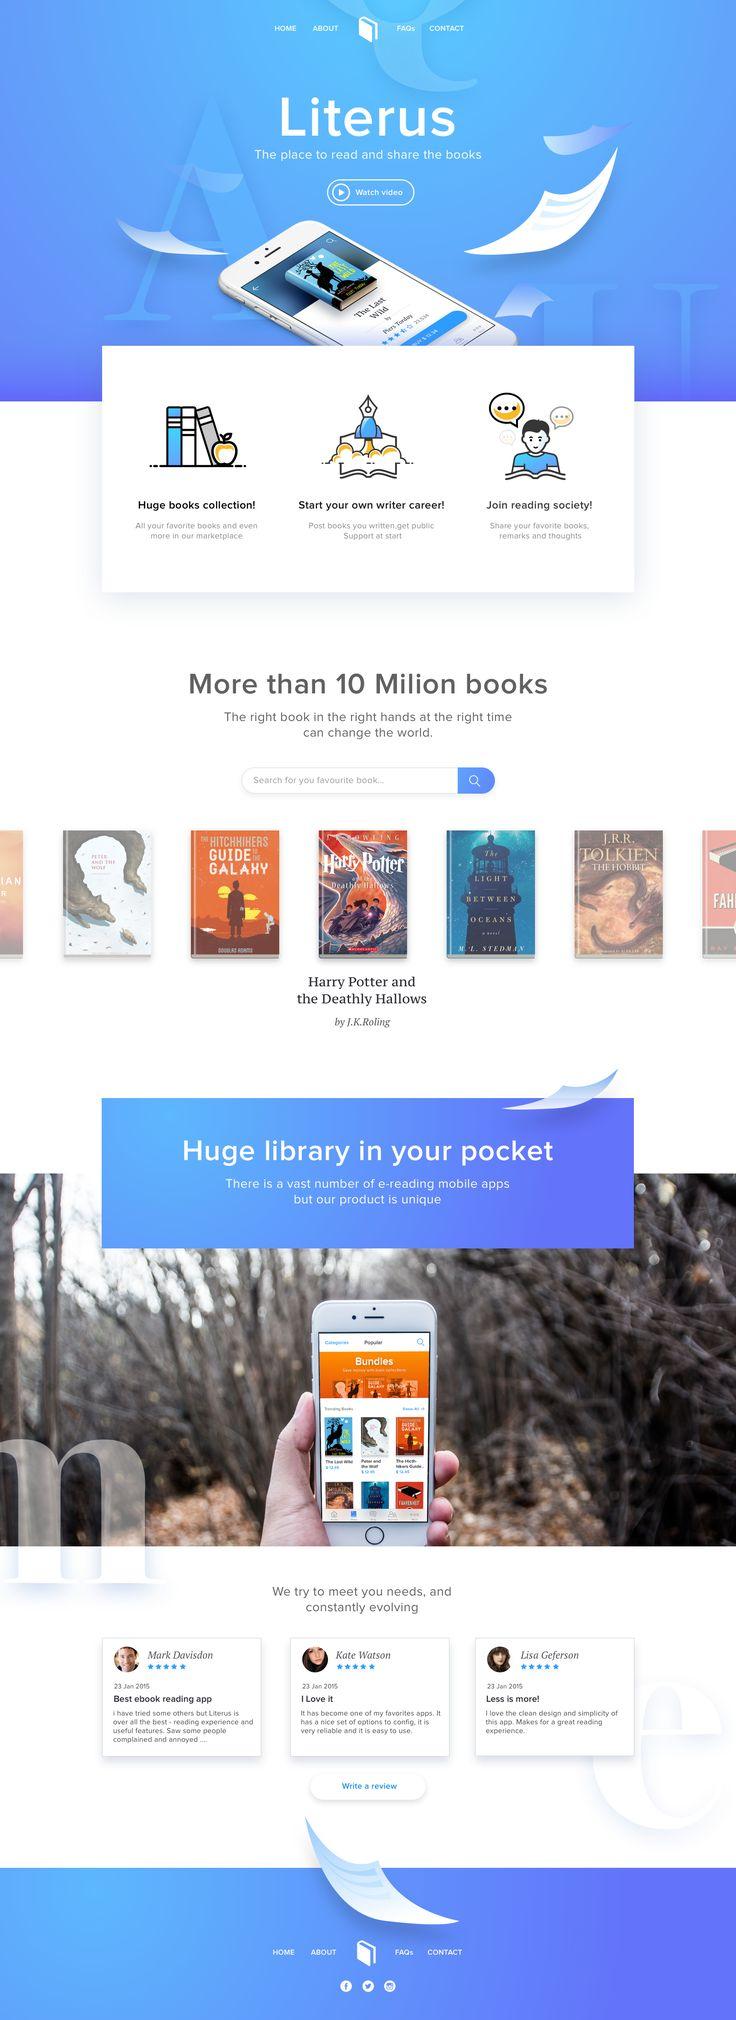 Dribbble - book_app_landing.png by Taras Bakusevych